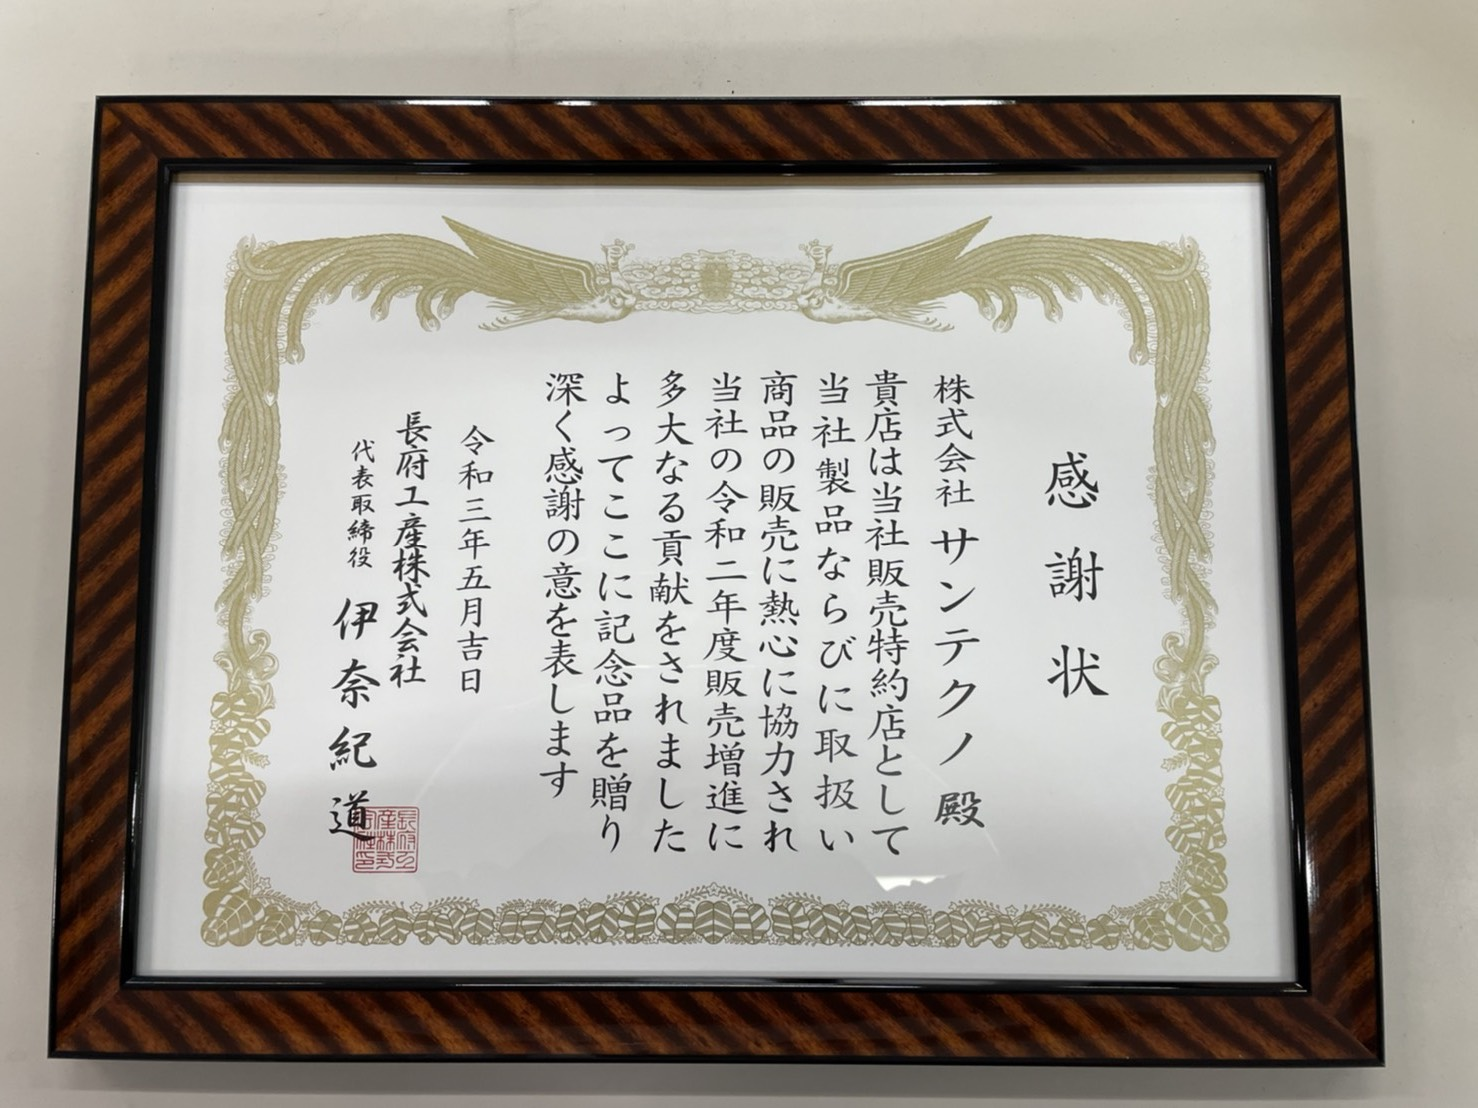 image0 長府工産株式会社様より賞状をいただきました。